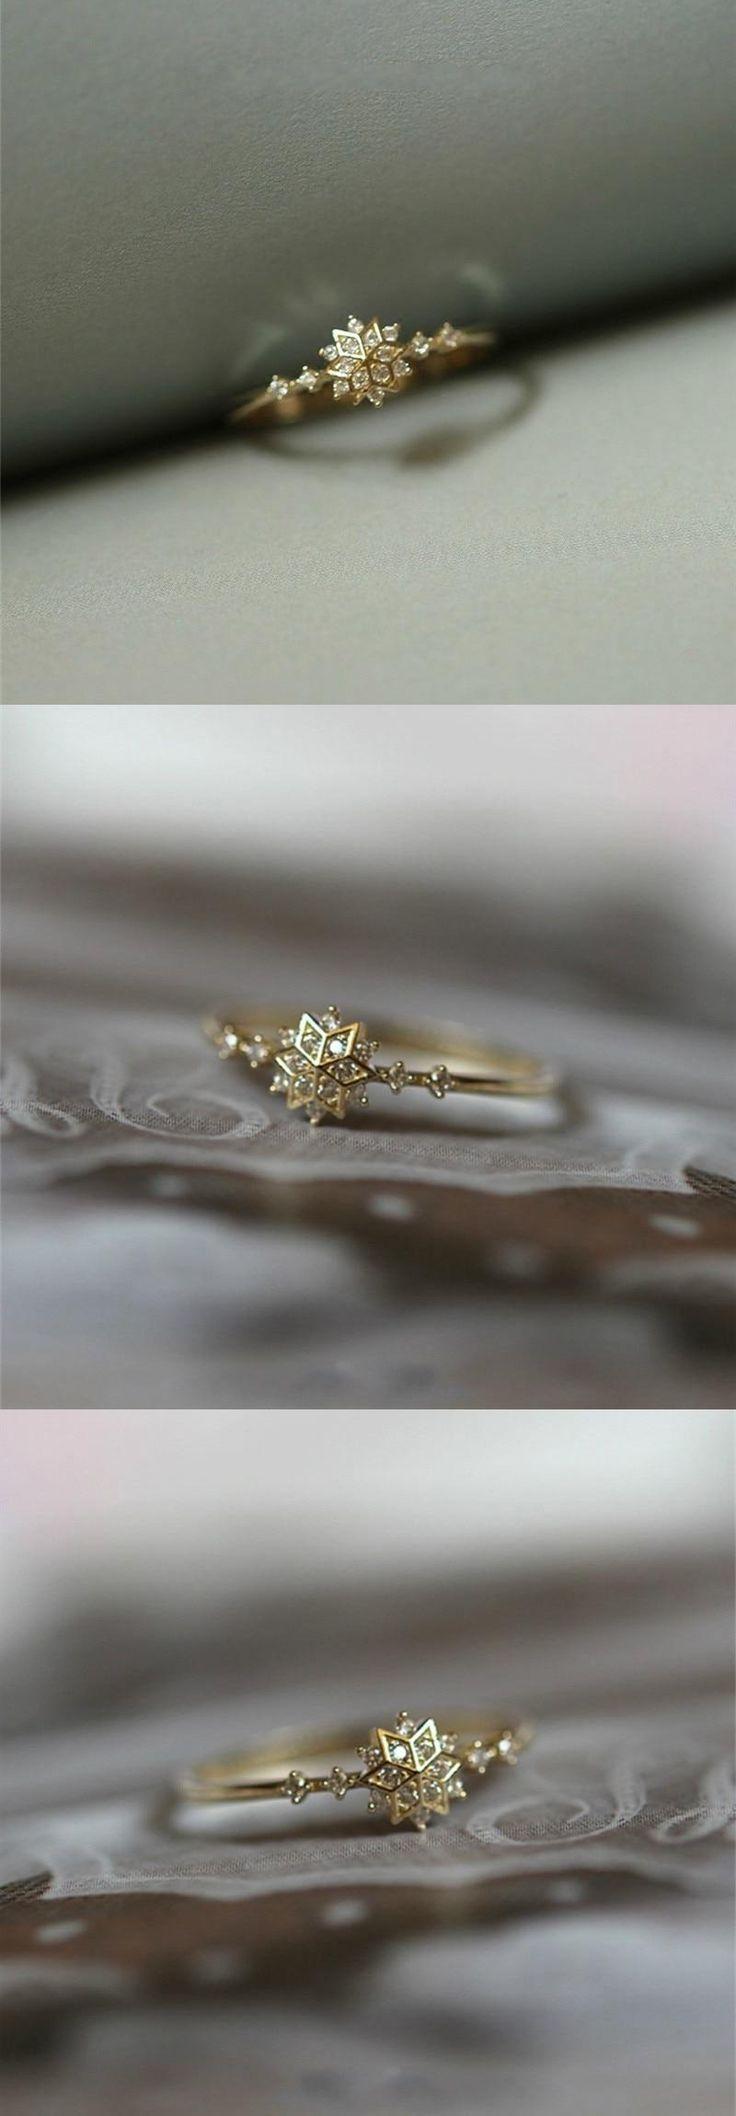 Photo of Snowflake Ring